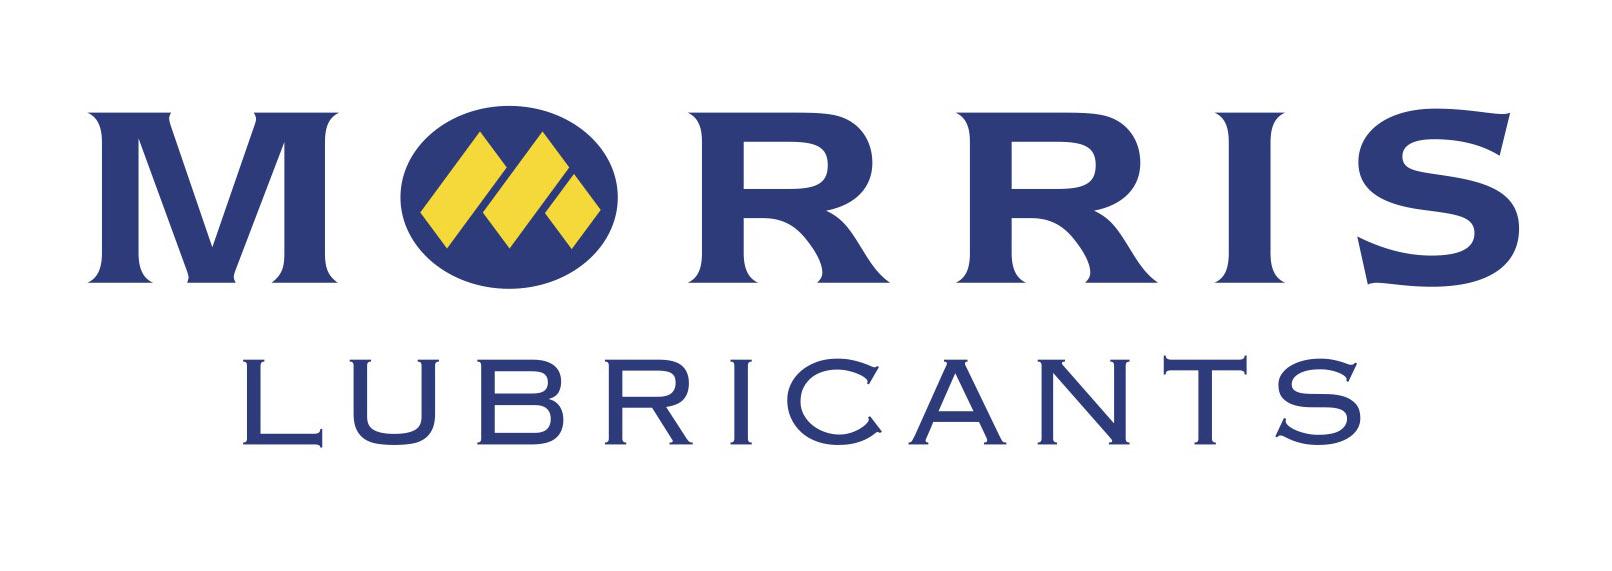 Morris Lubes Logo - Blue Yellow M.jpg